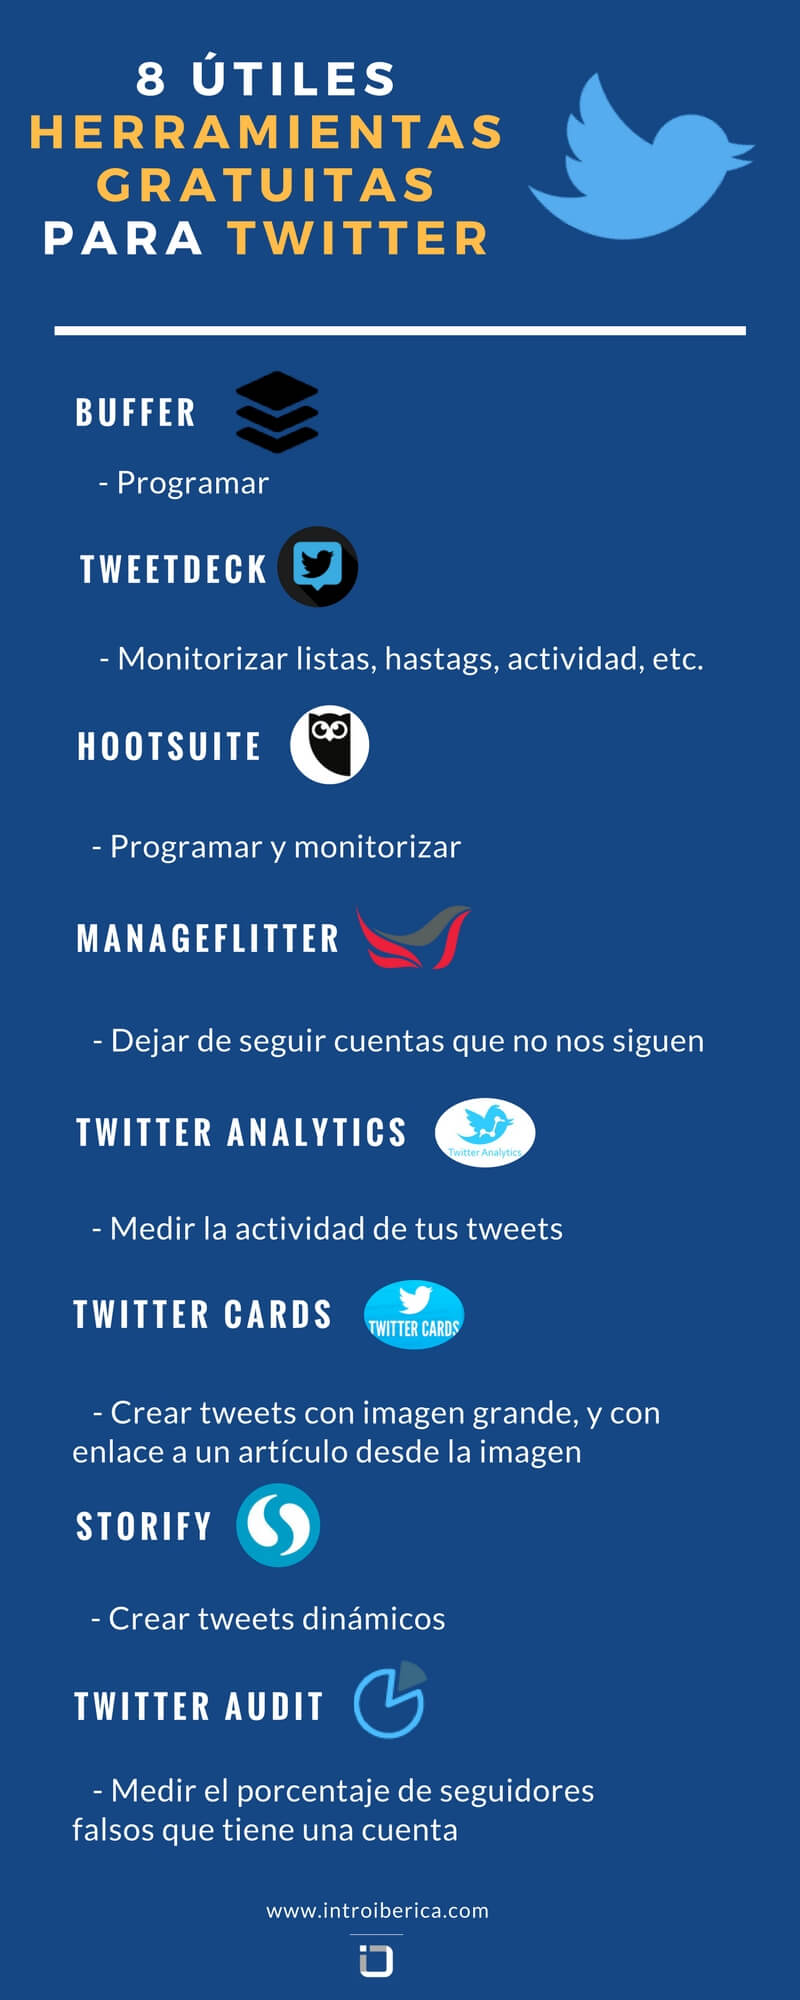 8 útiles herramientas gratuitas para Twitter